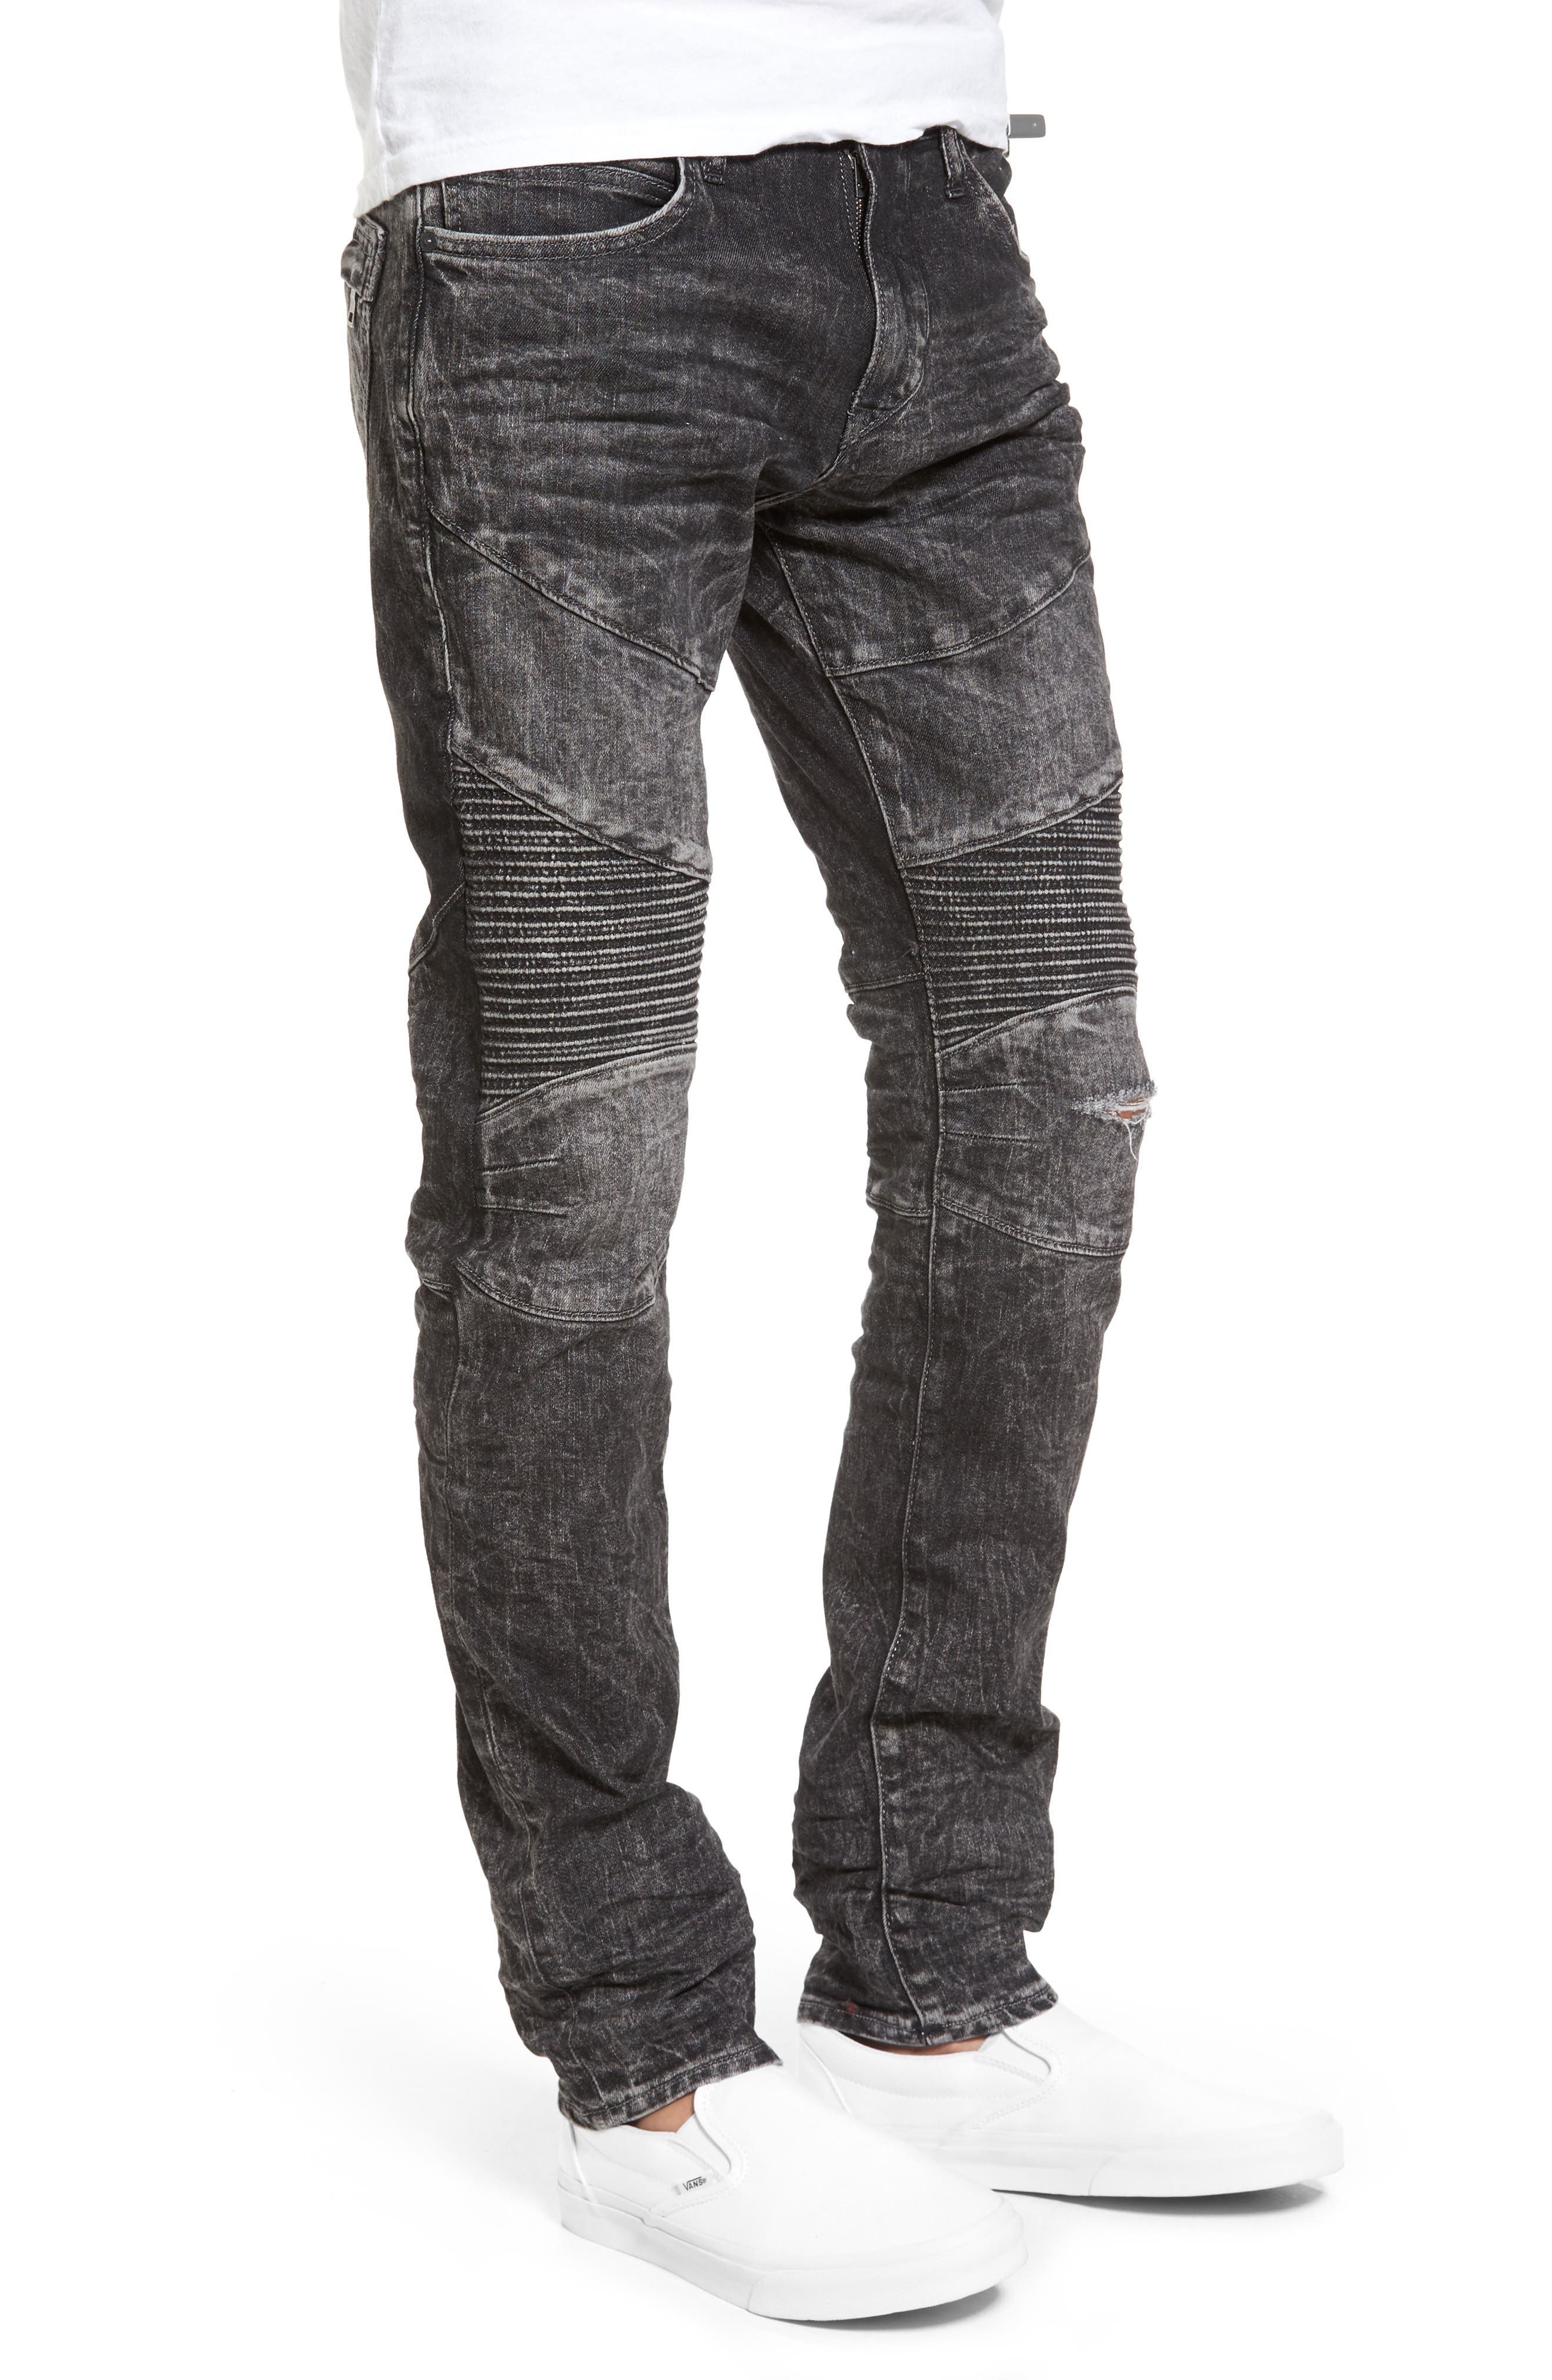 Rocco Skinny Fit Jeans,                             Alternate thumbnail 2, color,                             Dark Raven